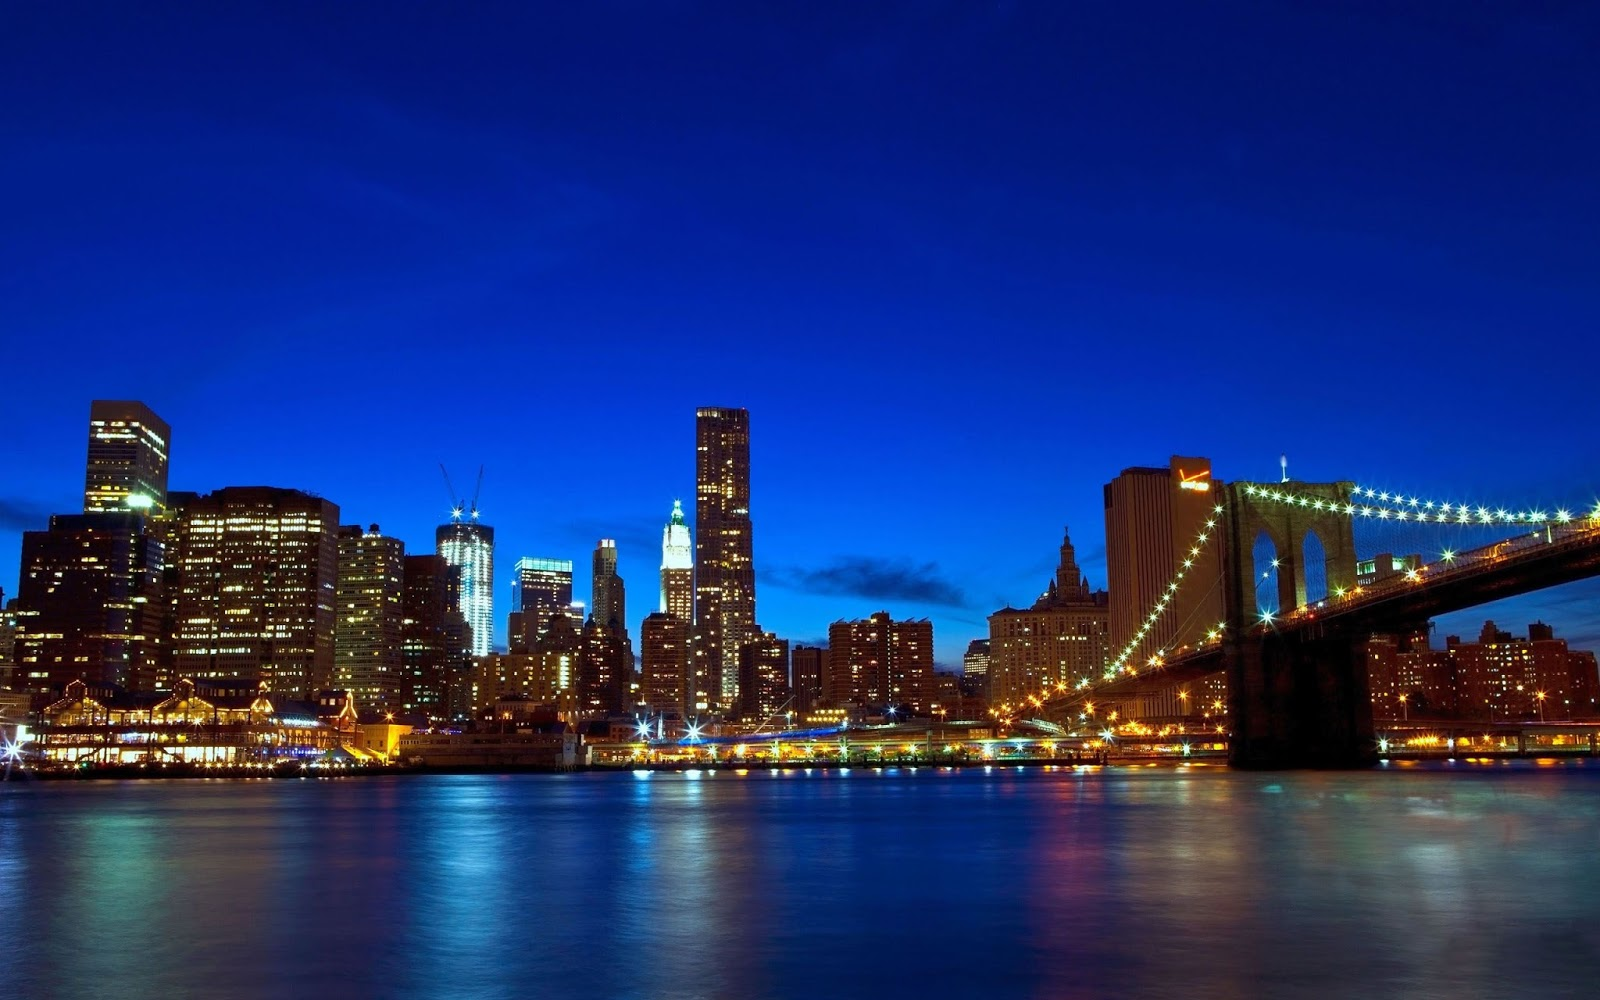 DREAM ZONE New York City HD Desktop Wallpapers 1600x1000